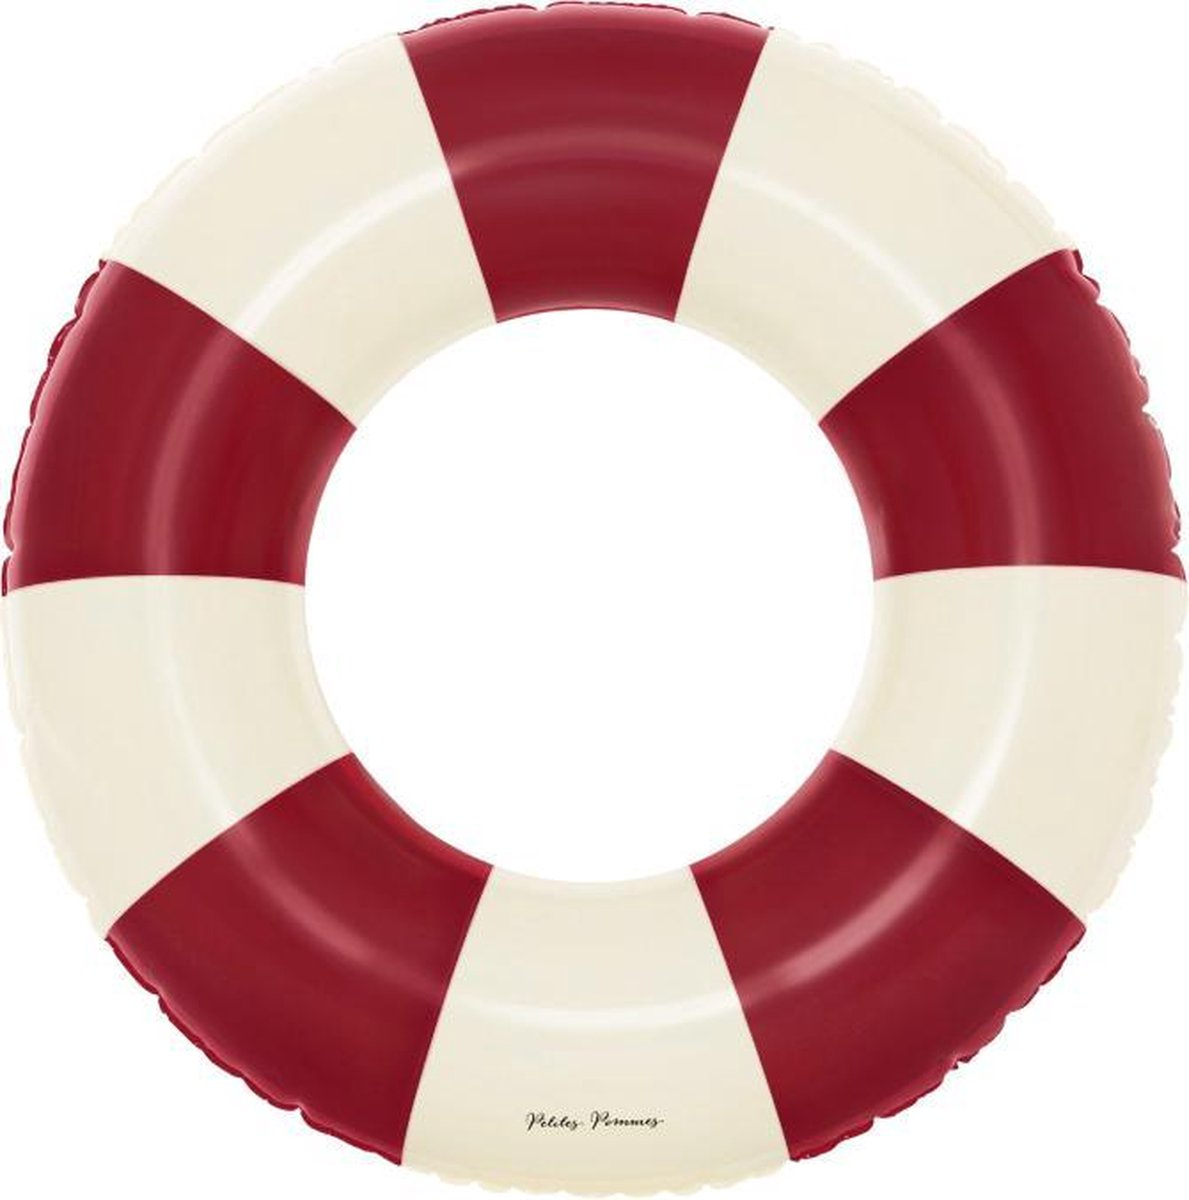 Petites Pommes Zwemring Olivia Ruby Red - Zwemband - 45 cm - 1 tot 3 jaar